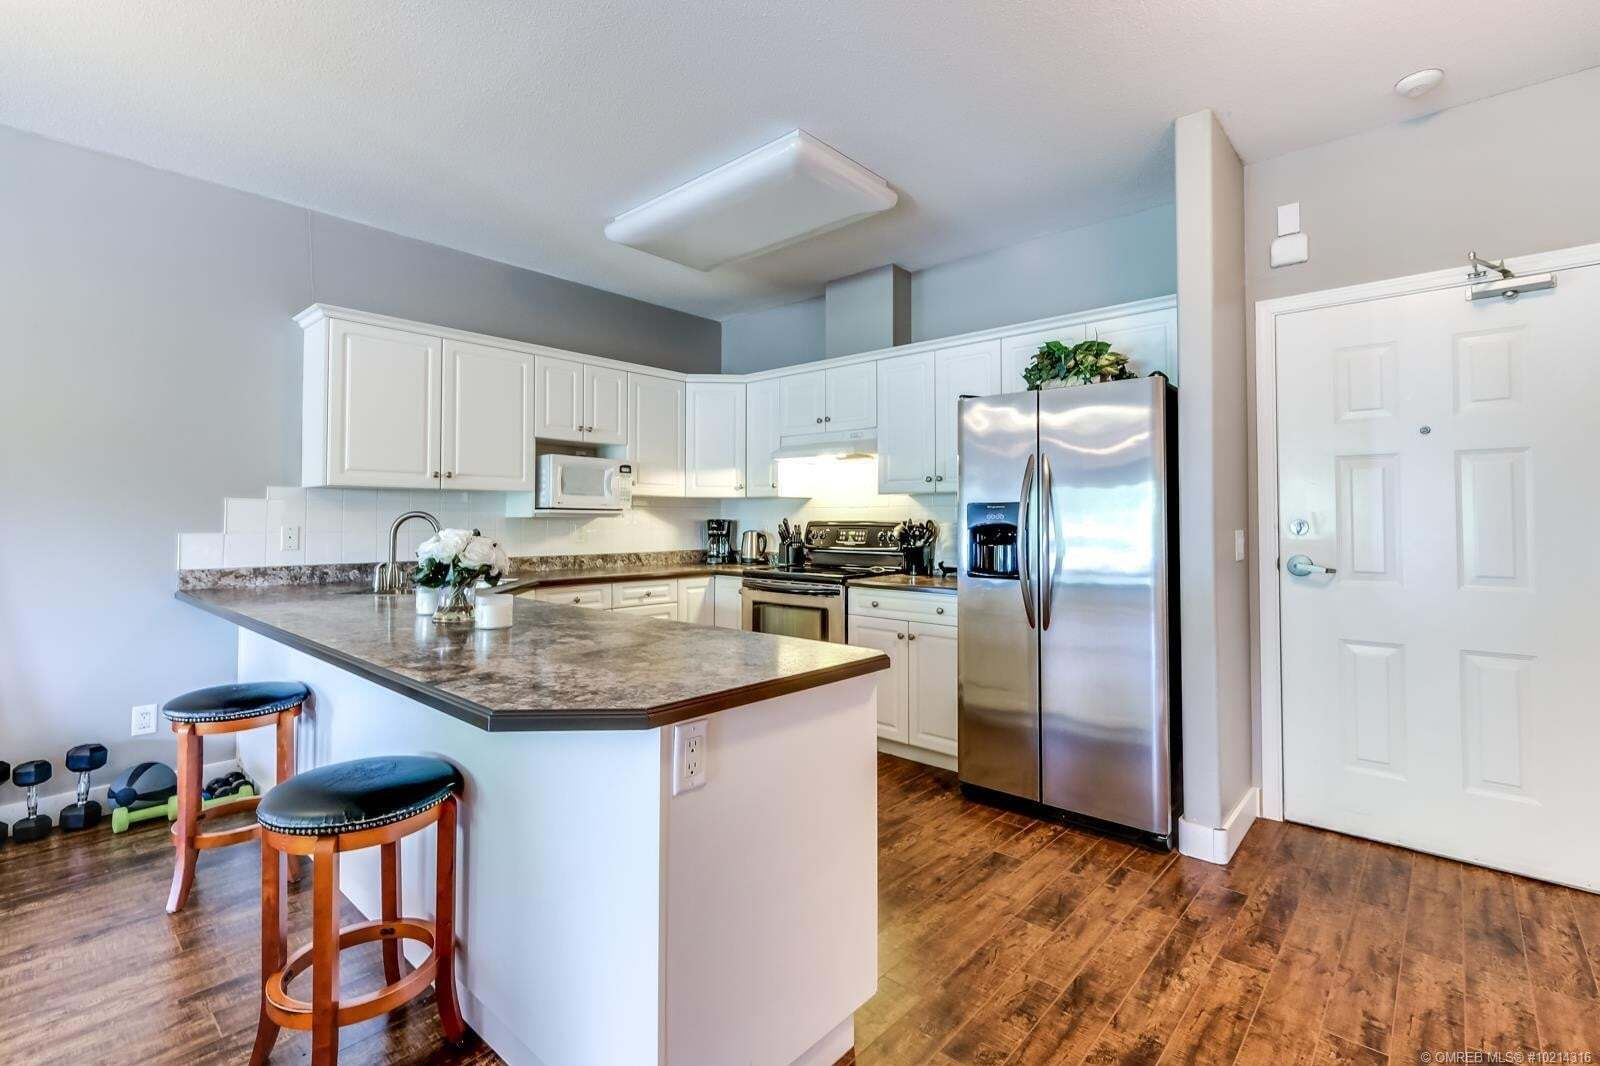 Condo for sale at 2300 Benvoulin Rd Kelowna British Columbia - MLS: 10214316